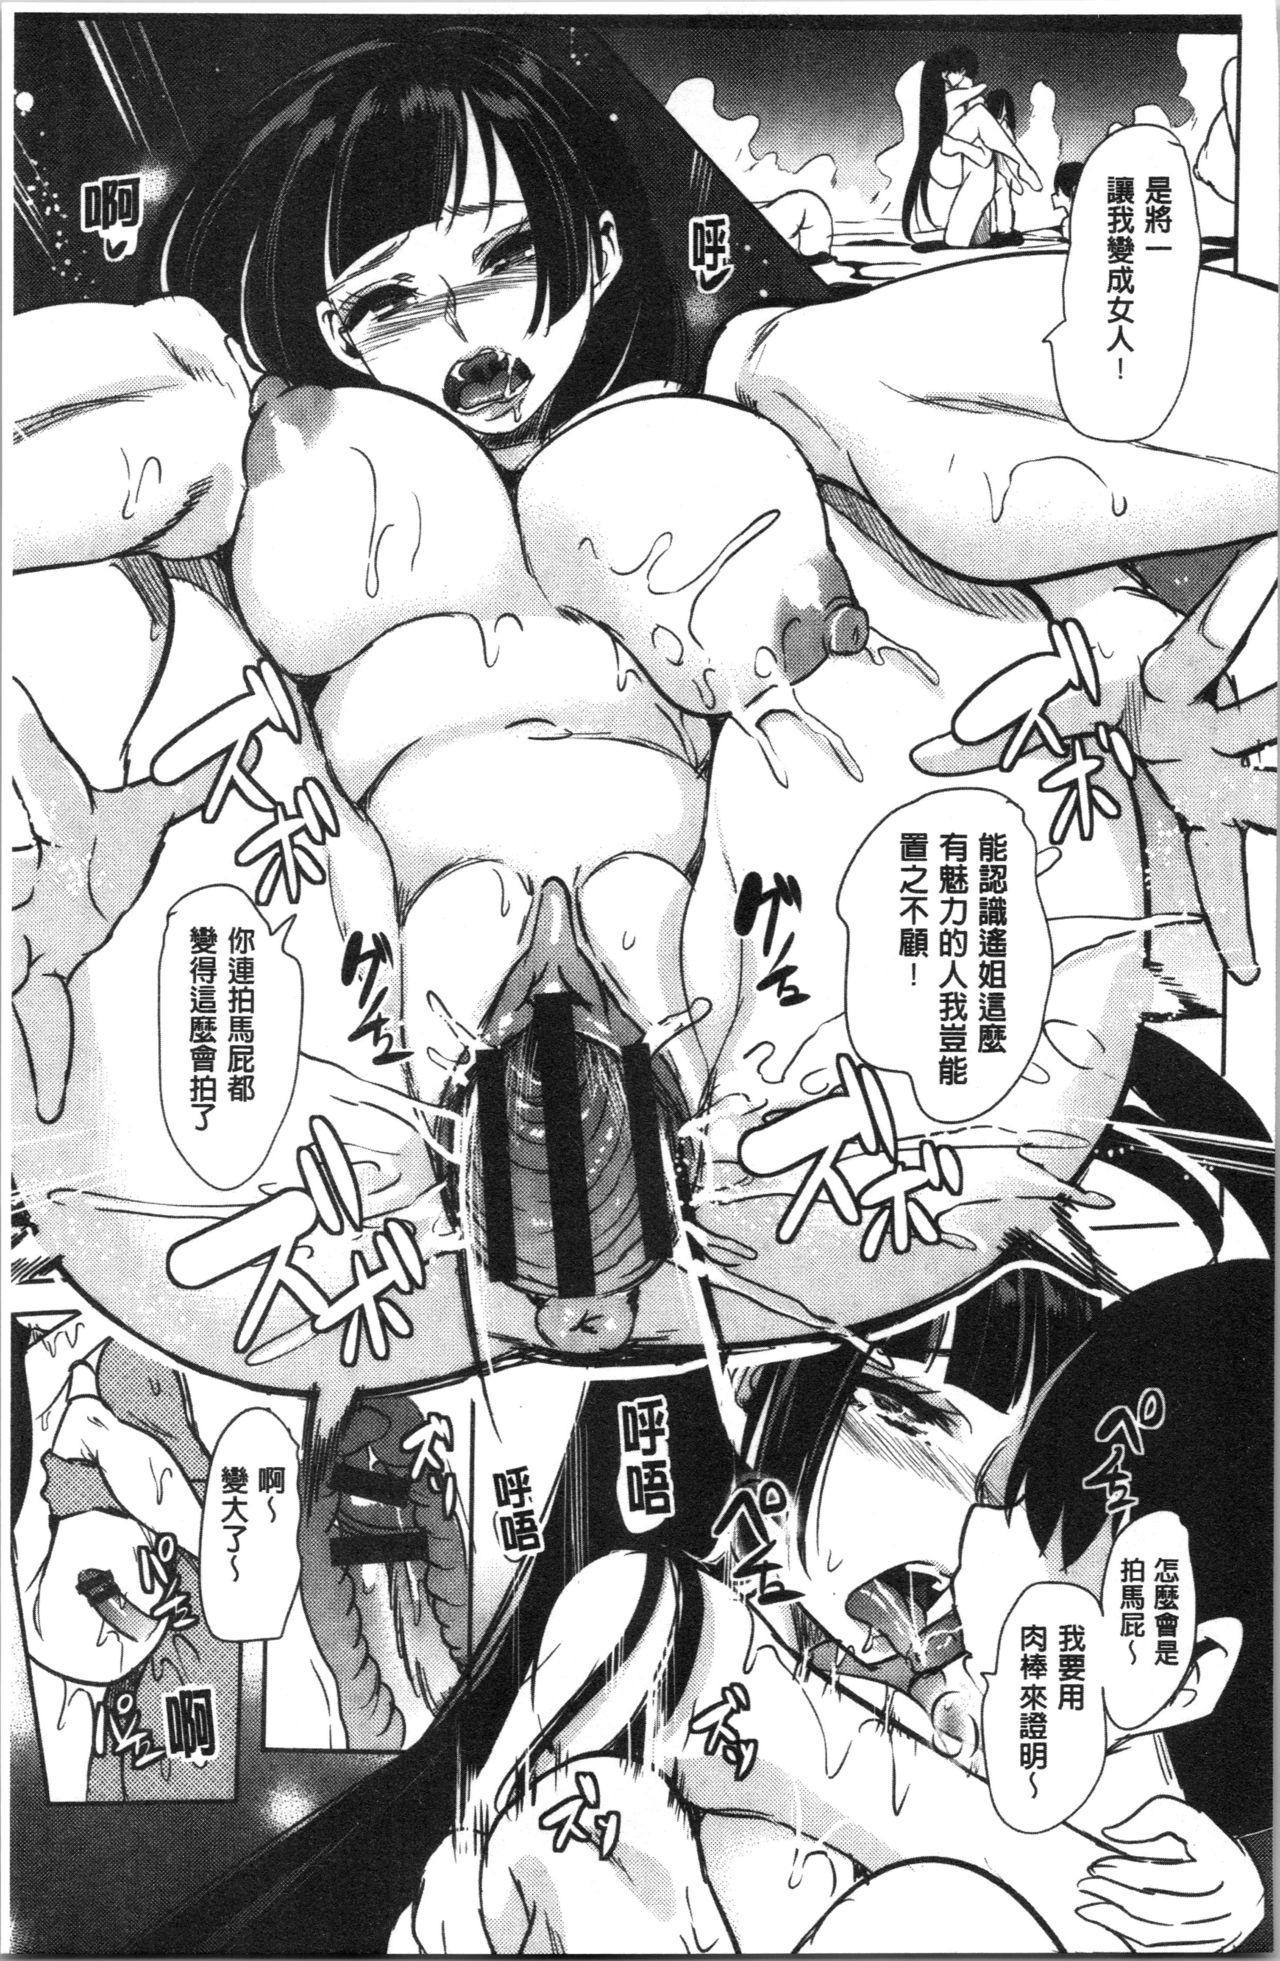 [Ootori Mahiro] Boku no Super Harem Sentou ~Otome no Naka ni Otoko wa Boku dake~ - My super harlem public bath, I am the only man in the public bath full of pussy cats. | 我的後宮選妃般的超級錢湯~乙女之間只有我一個男人~ [Chinese] 194